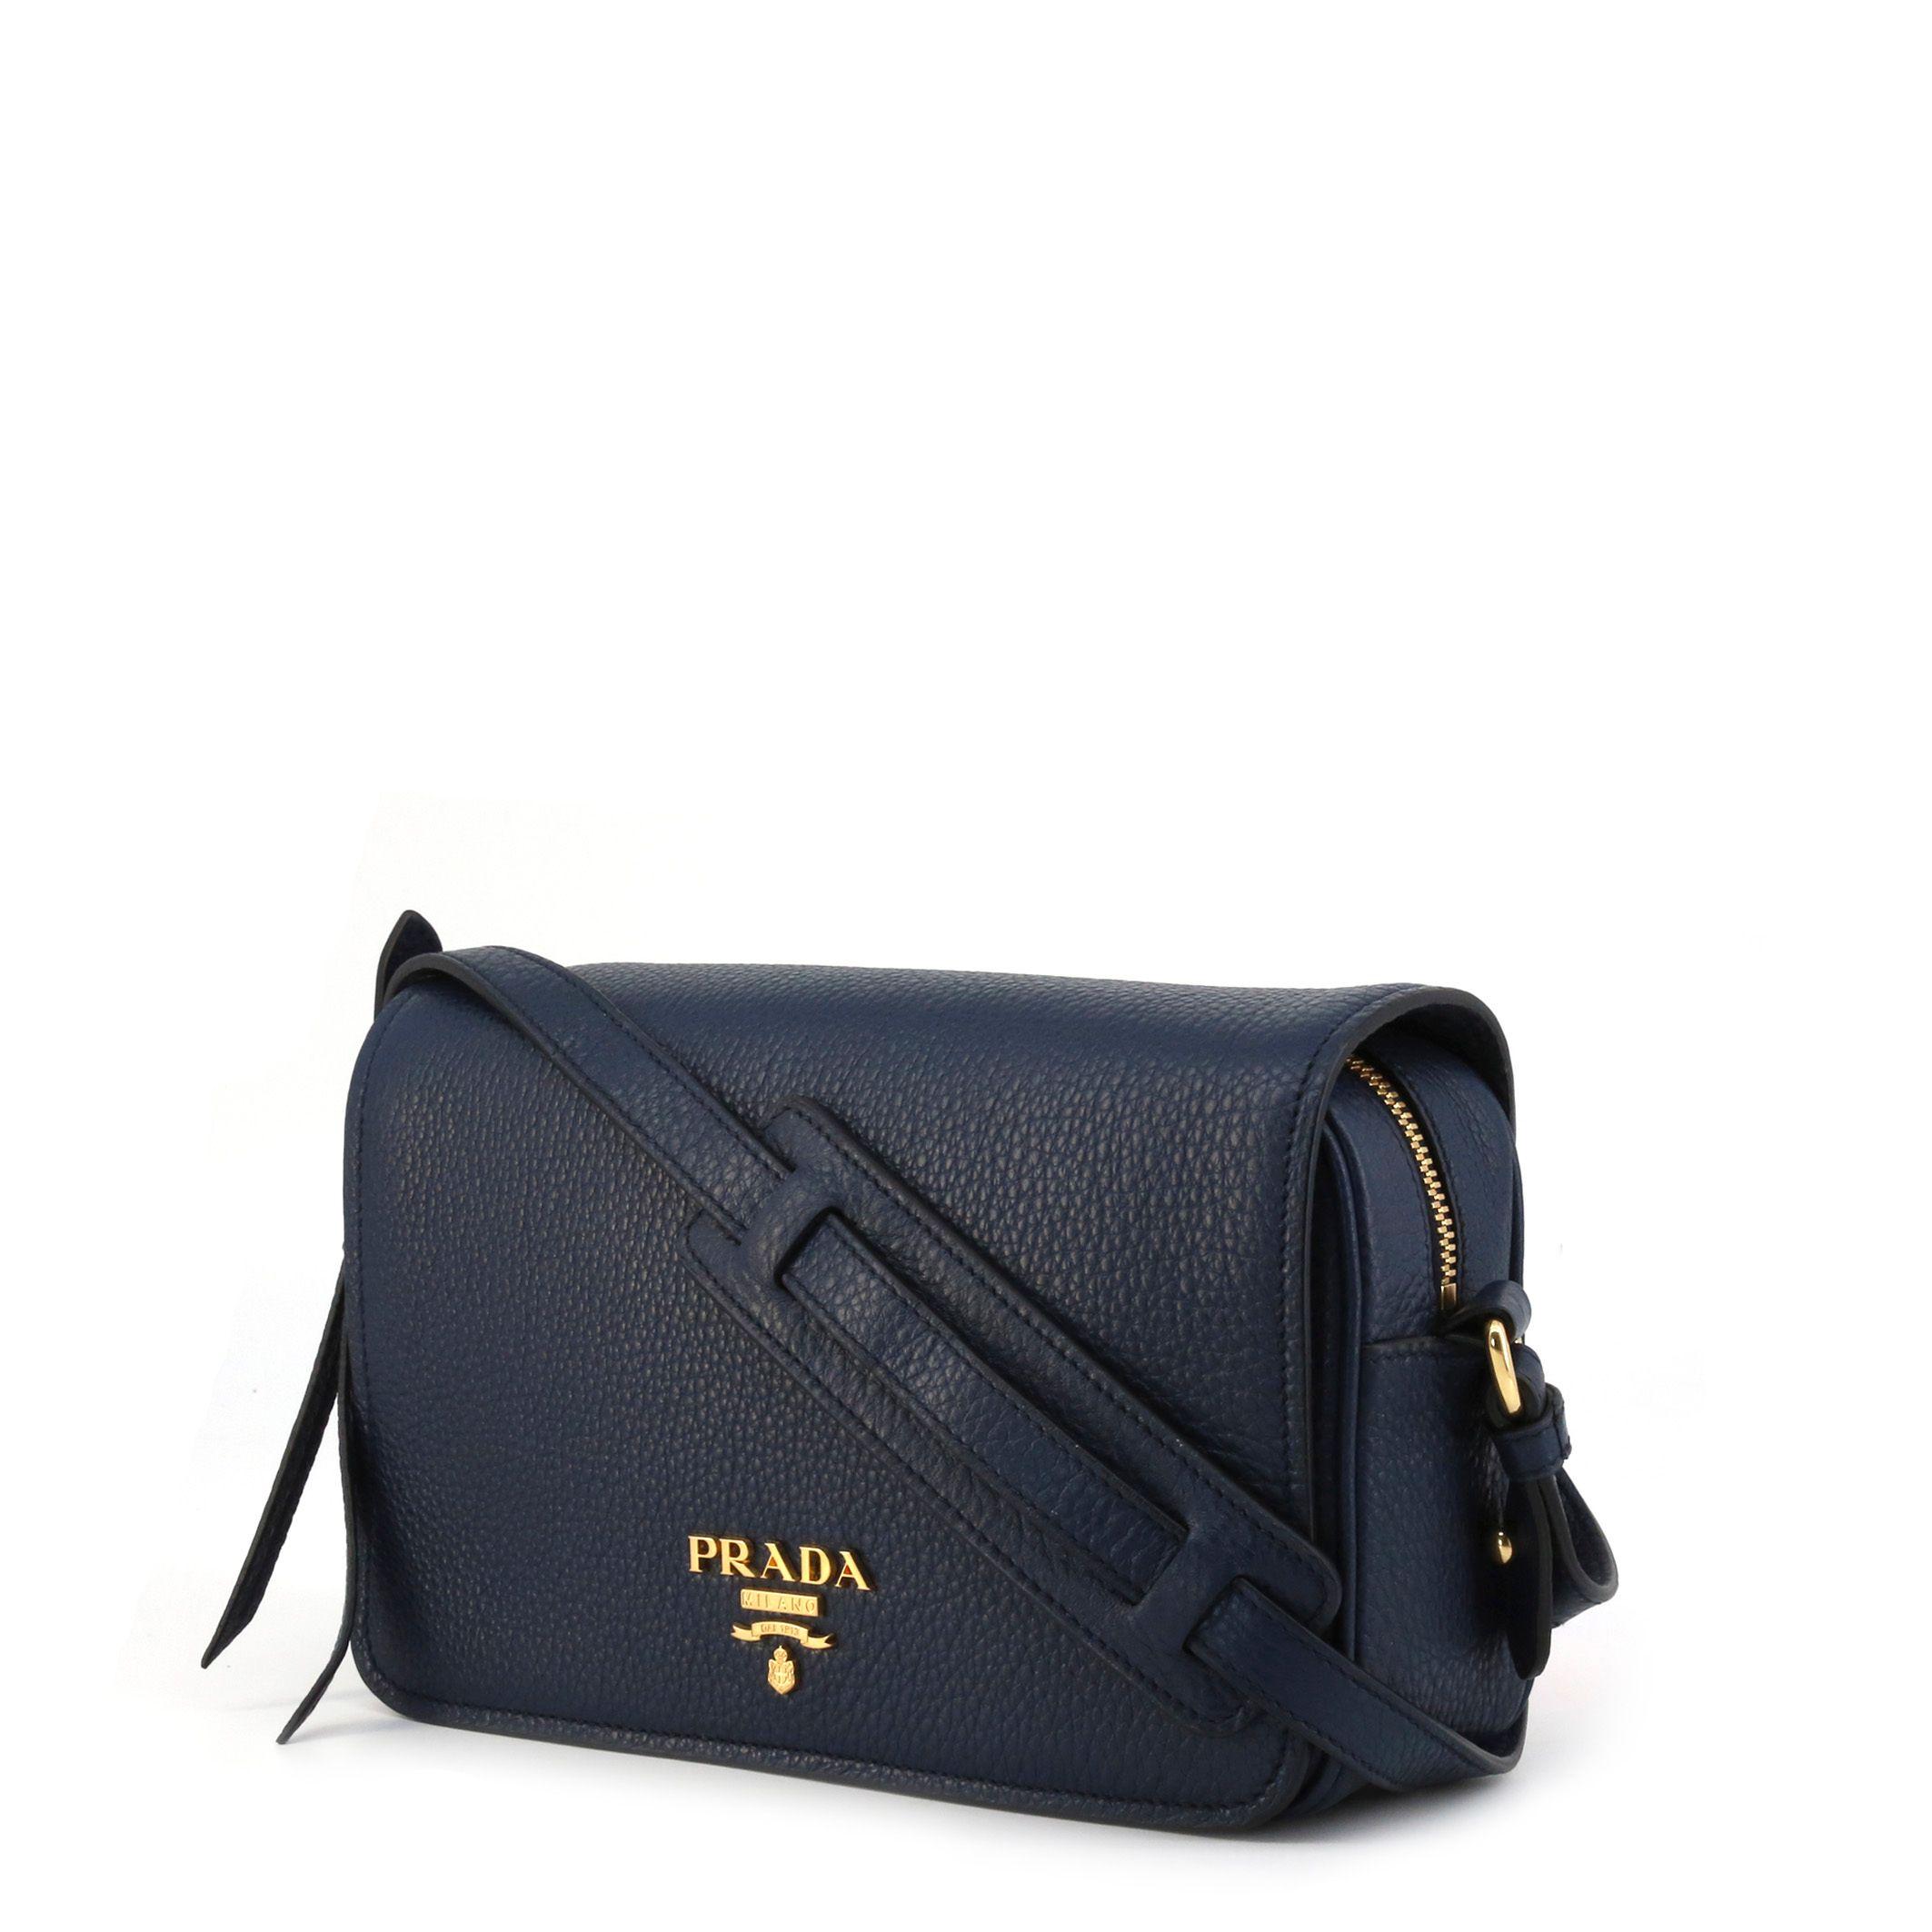 Prada - 1BD163_2E8K | You Fashion Outlet